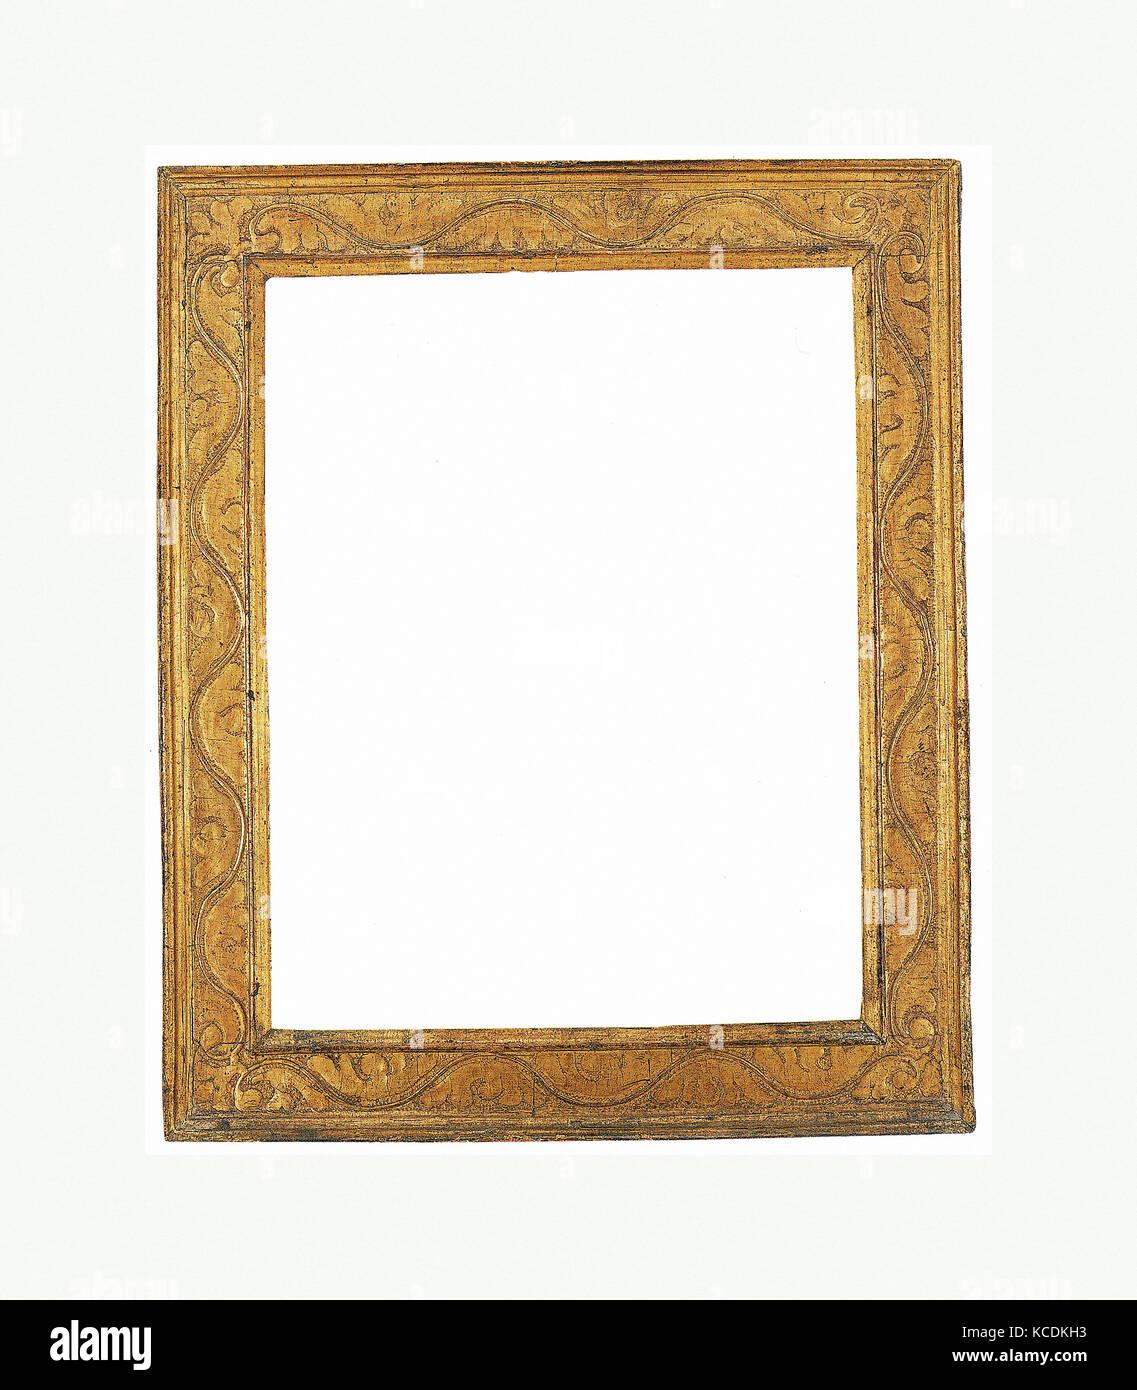 Niedlich 12 X 20 Rahmen Ideen - Benutzerdefinierte Bilderrahmen ...